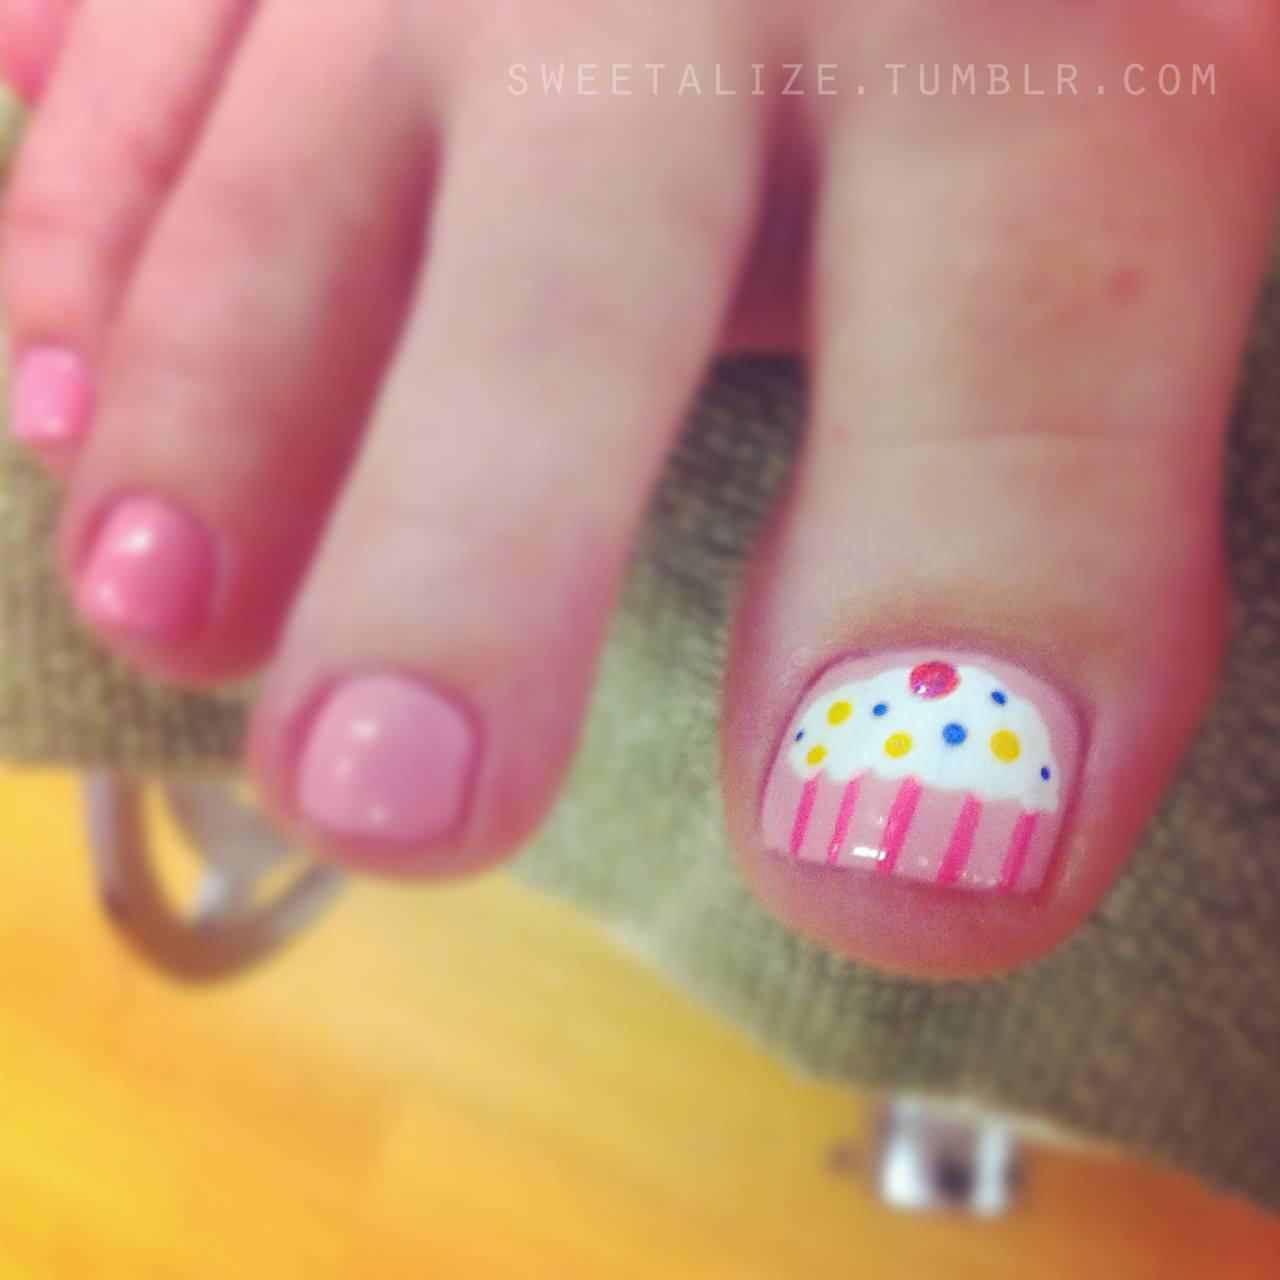 8 Cute Cupcake Nail Art Design For Toe Nails